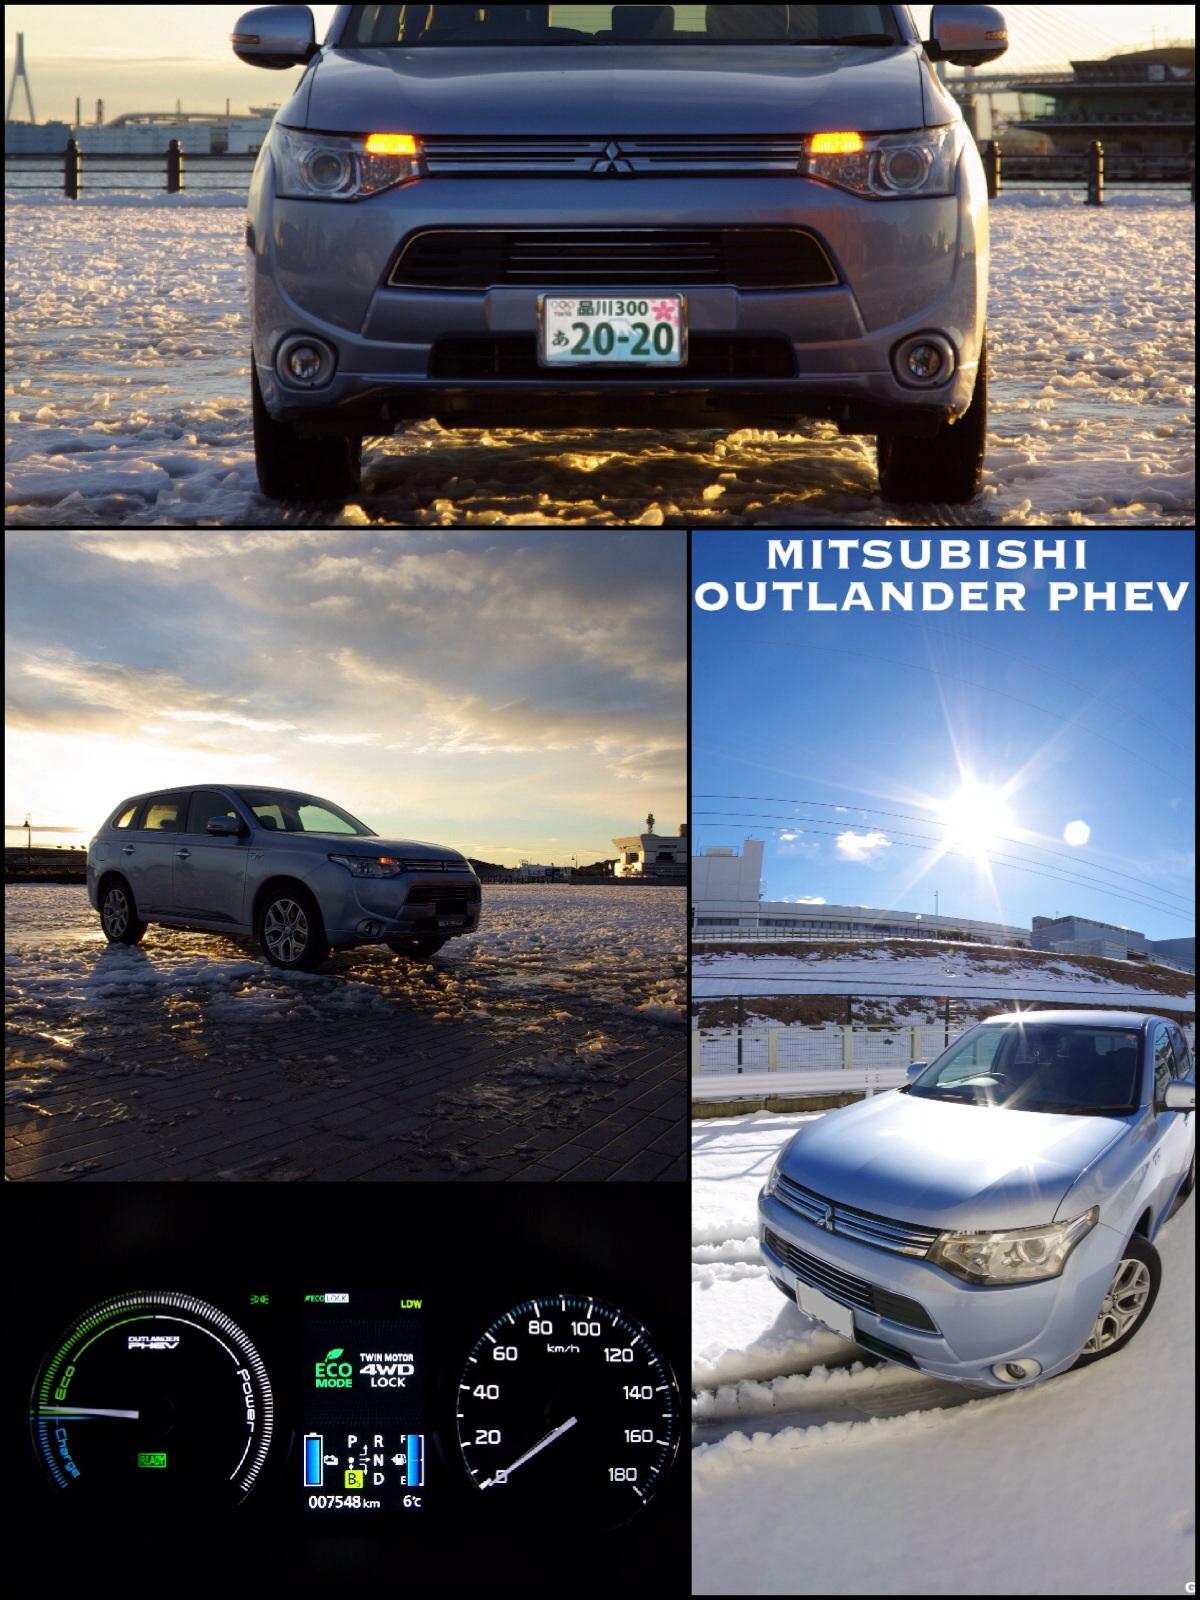 Mitsubishi outlander phev on snow